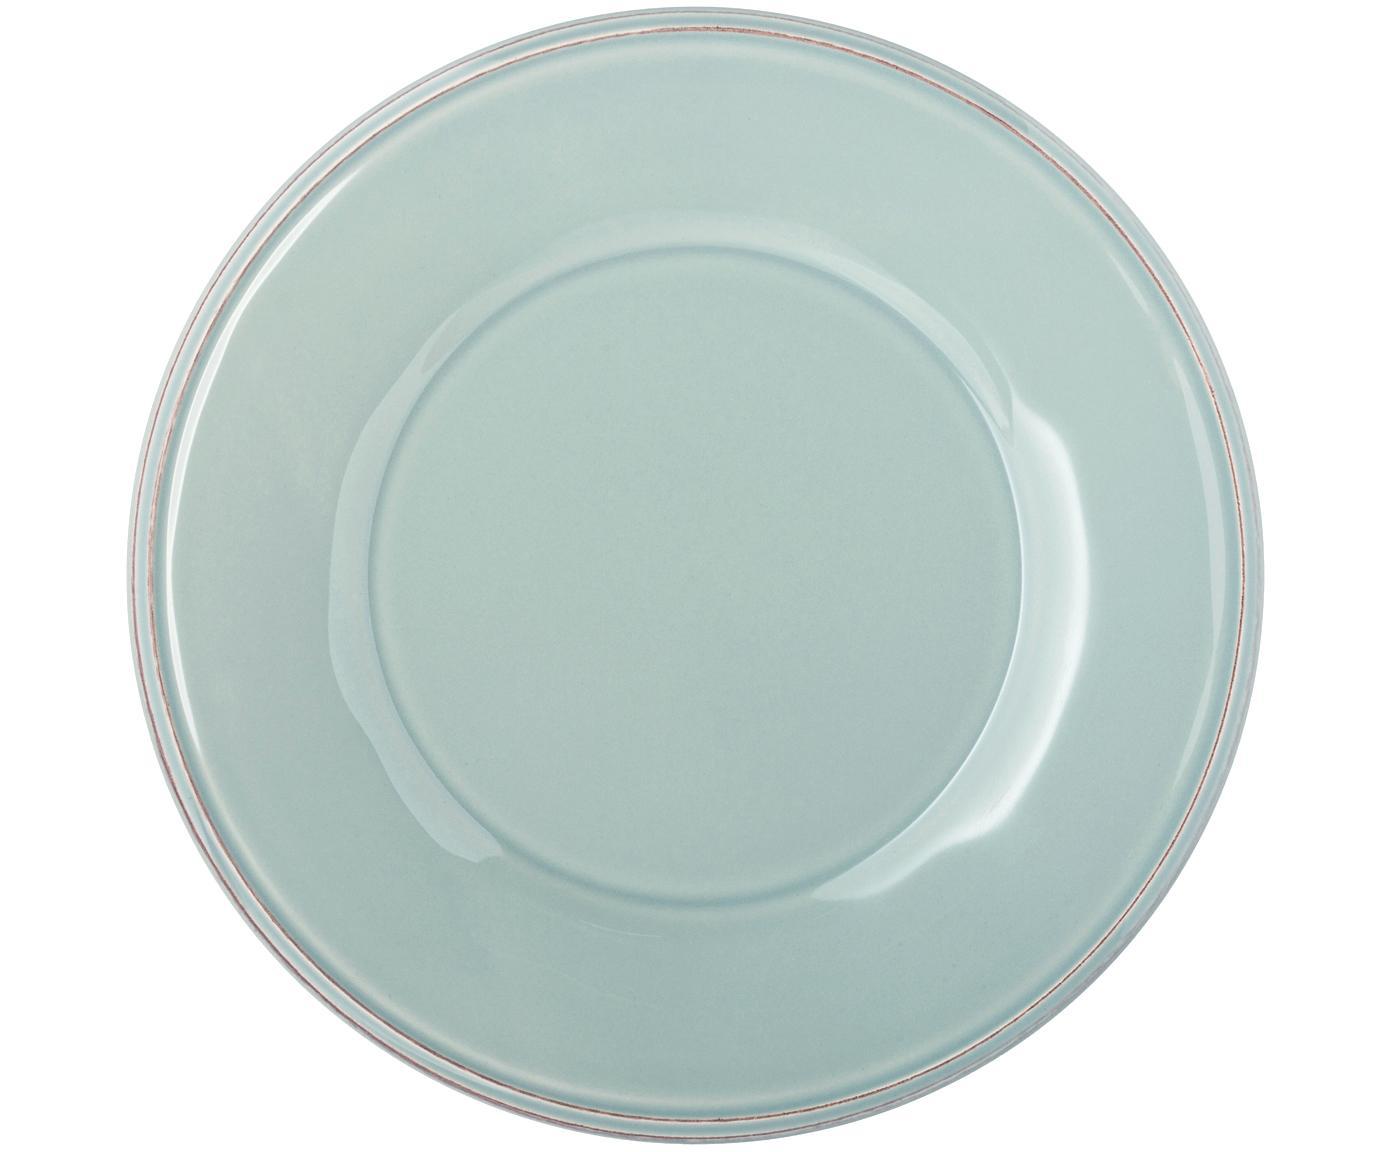 Frühstücksteller Constance in Mint, 2 Stück, Steingut, Blau,Türkis, Ø 24 cm